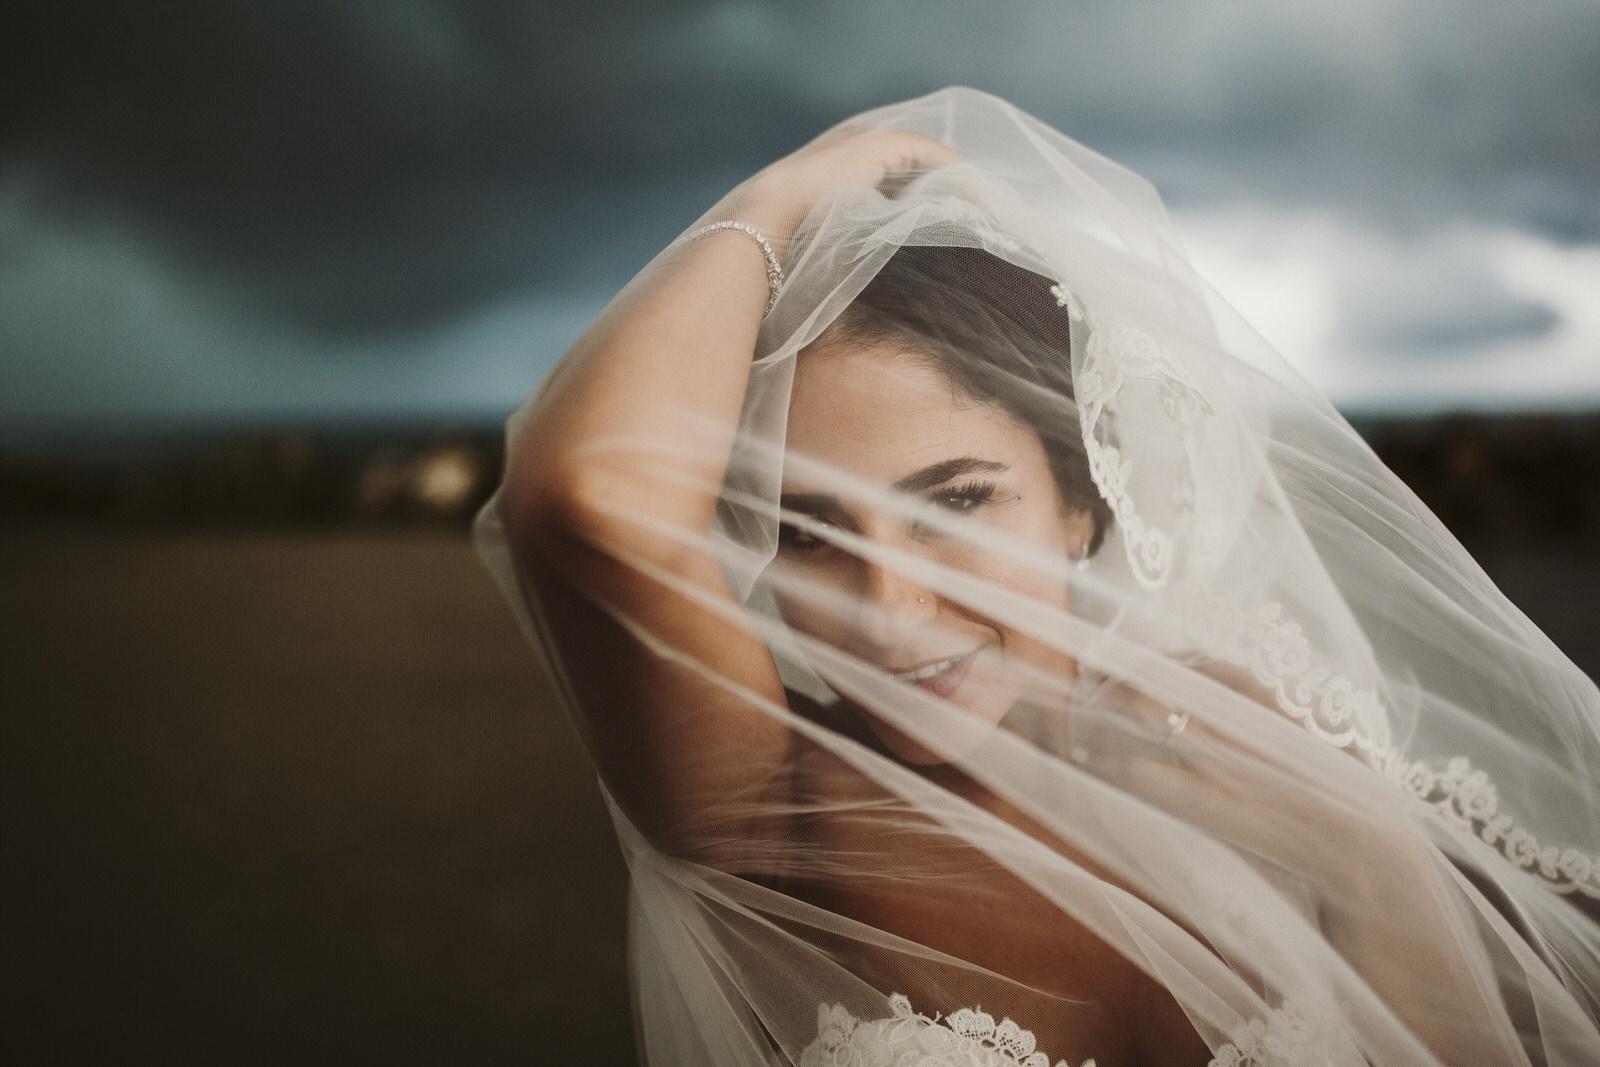 wedding photographer in italy-venice-tuscany-florence-amalfi coast-como lake-villa del balbianello-siena-amalfi-ravello-belmond-villa cimbrone68